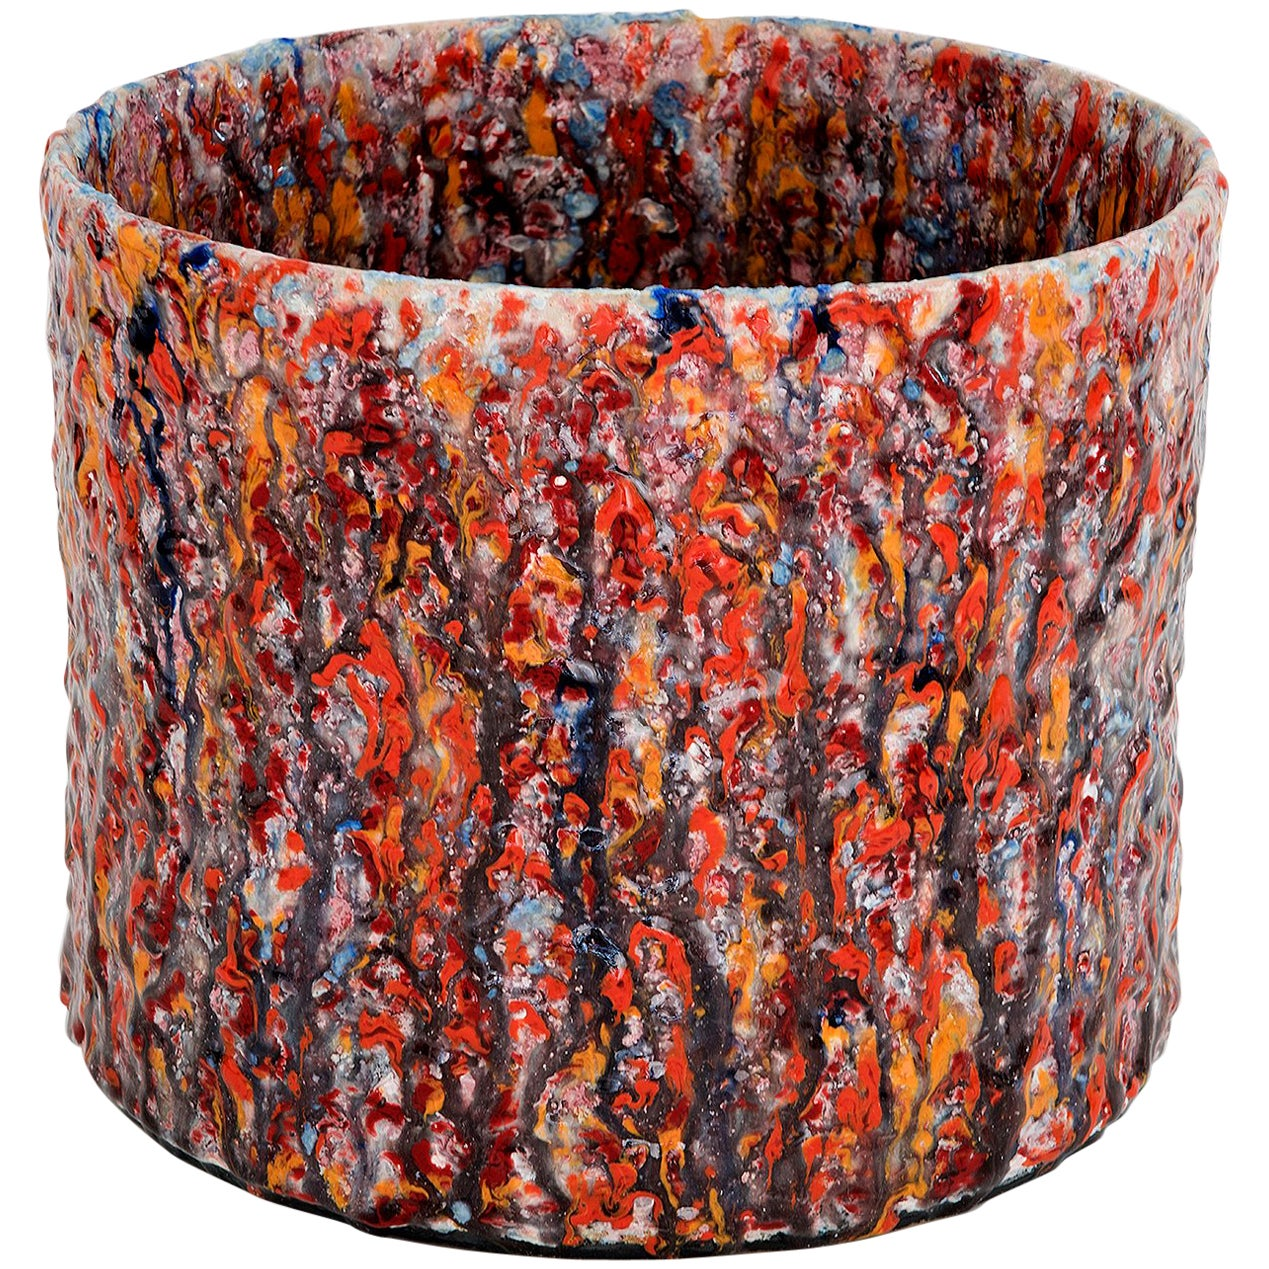 "Contemporary Red Textured Ceramic Vase Model ""#1914"" by Morten Løbner Espersen"